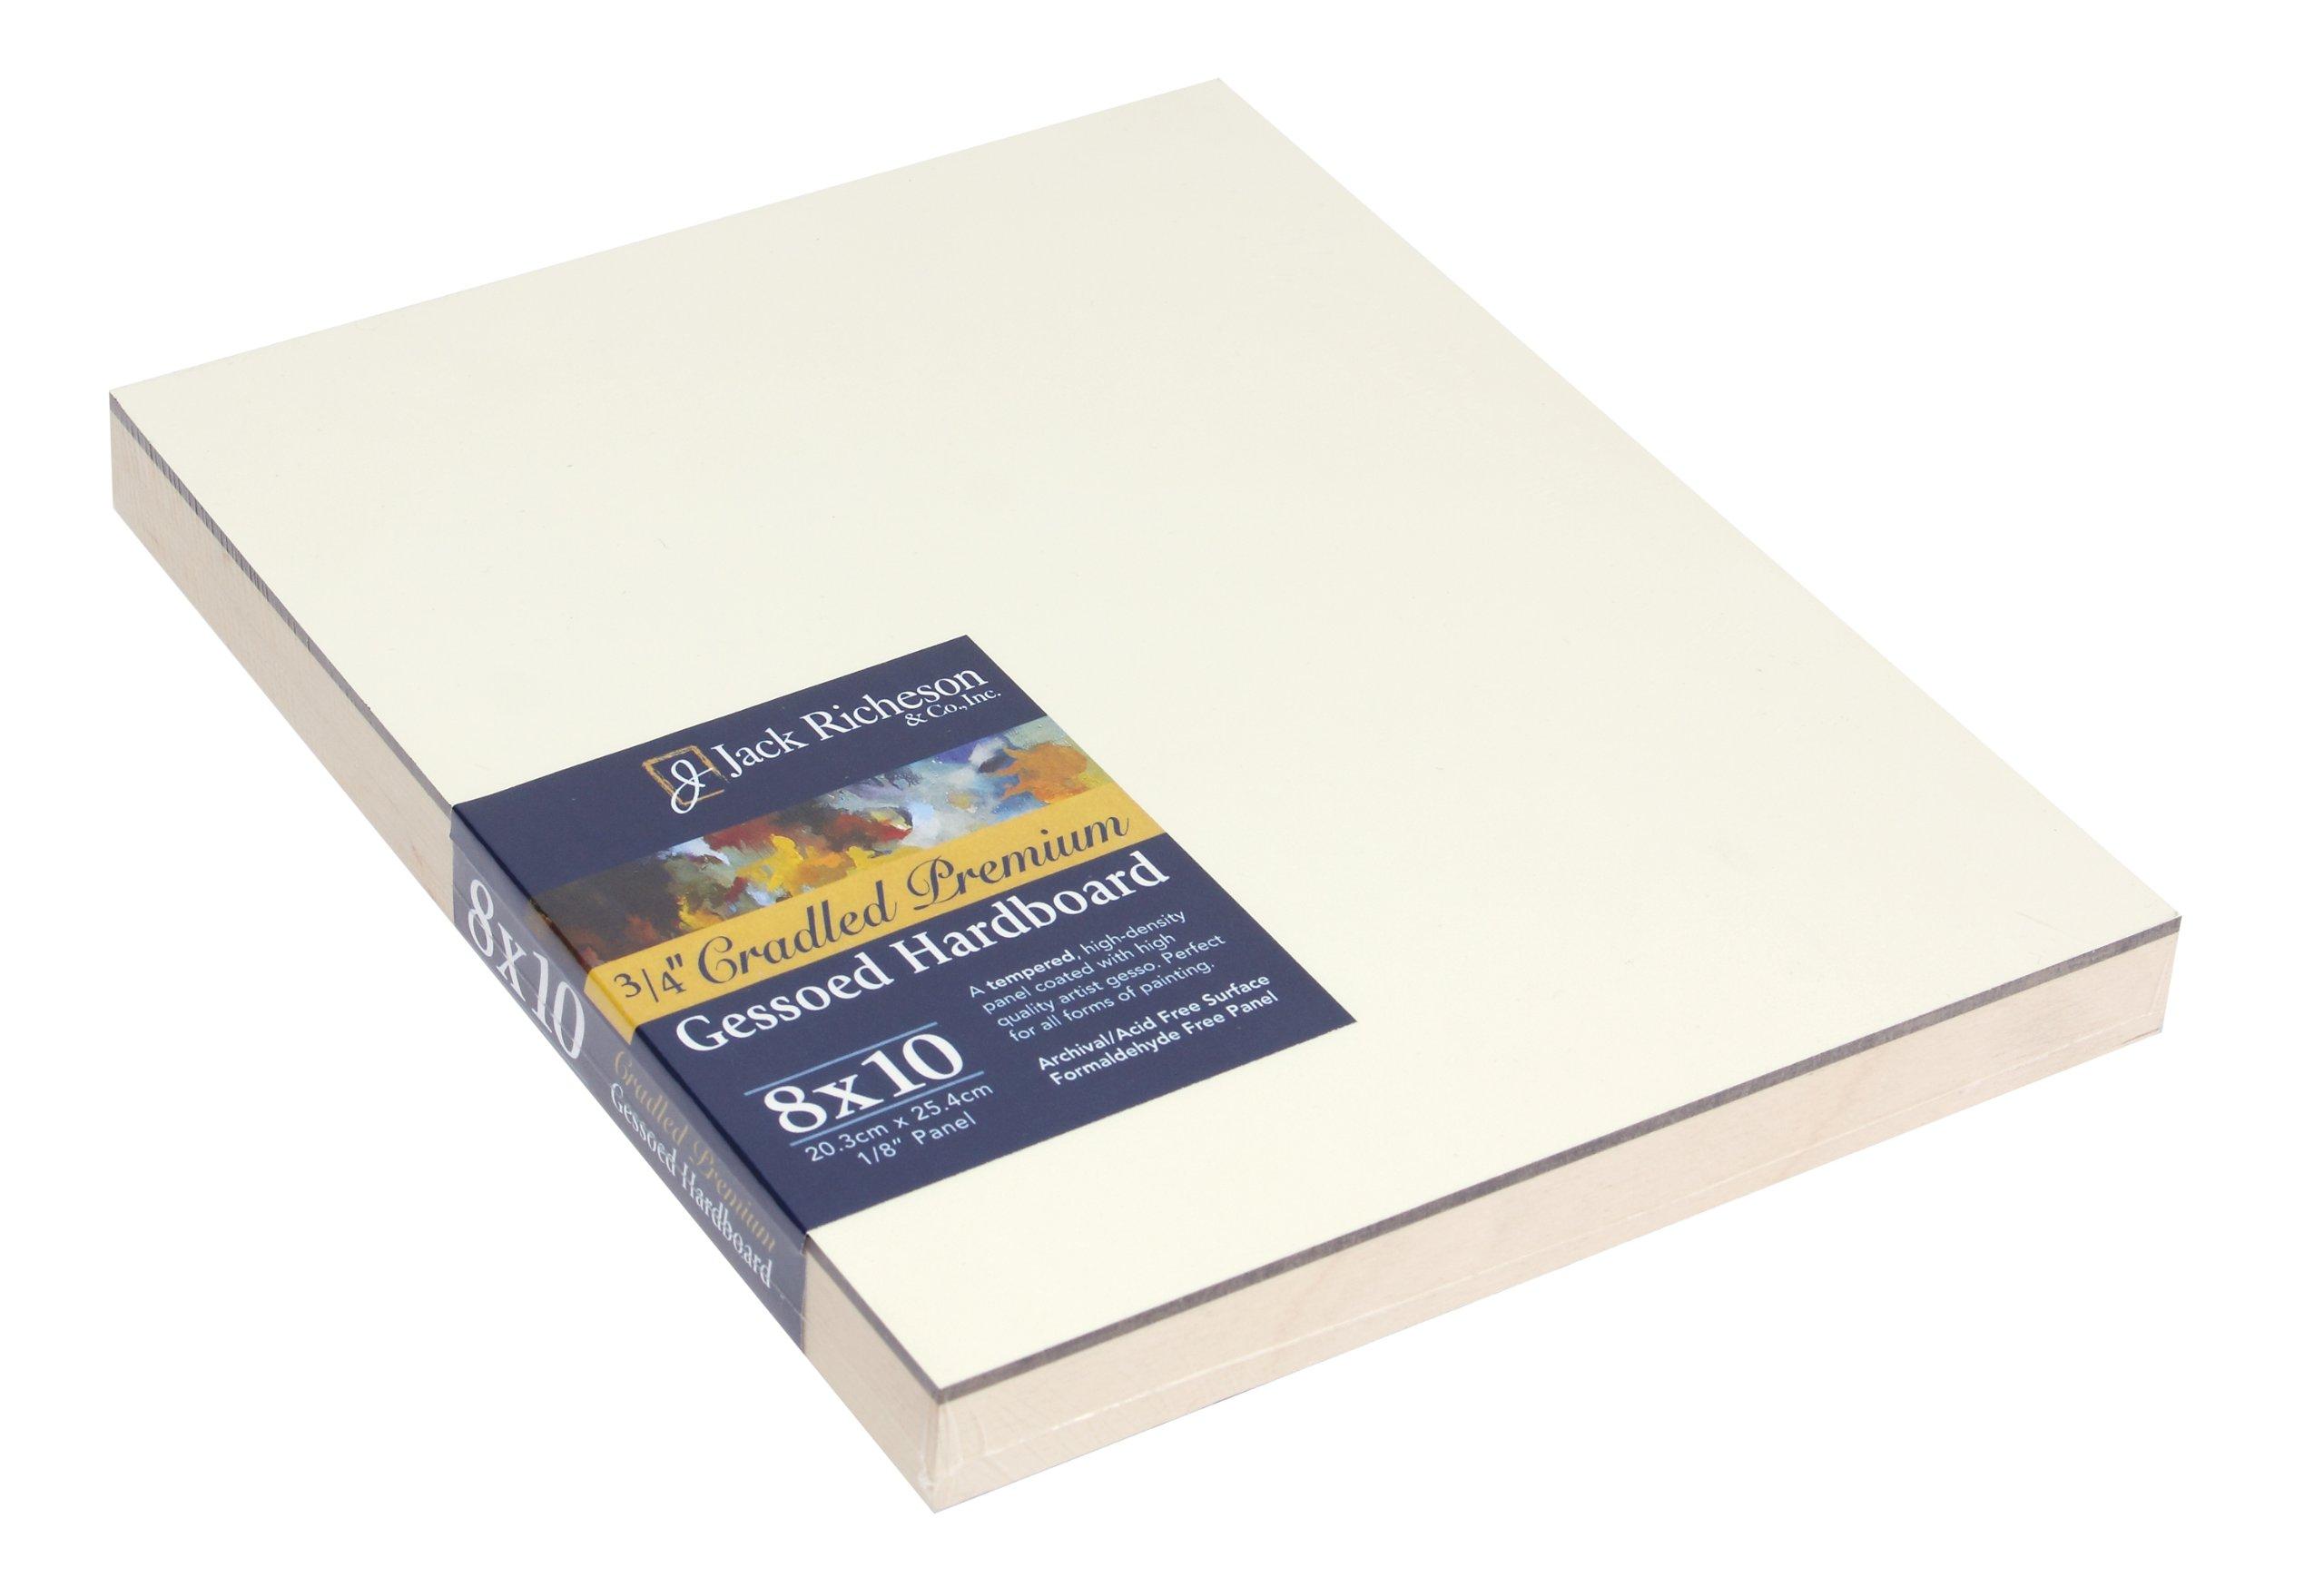 Jack Richeson 3/4-Inch Premium Tempered Gessoed Hardboard Panel, 8-Inch by 10-Inch